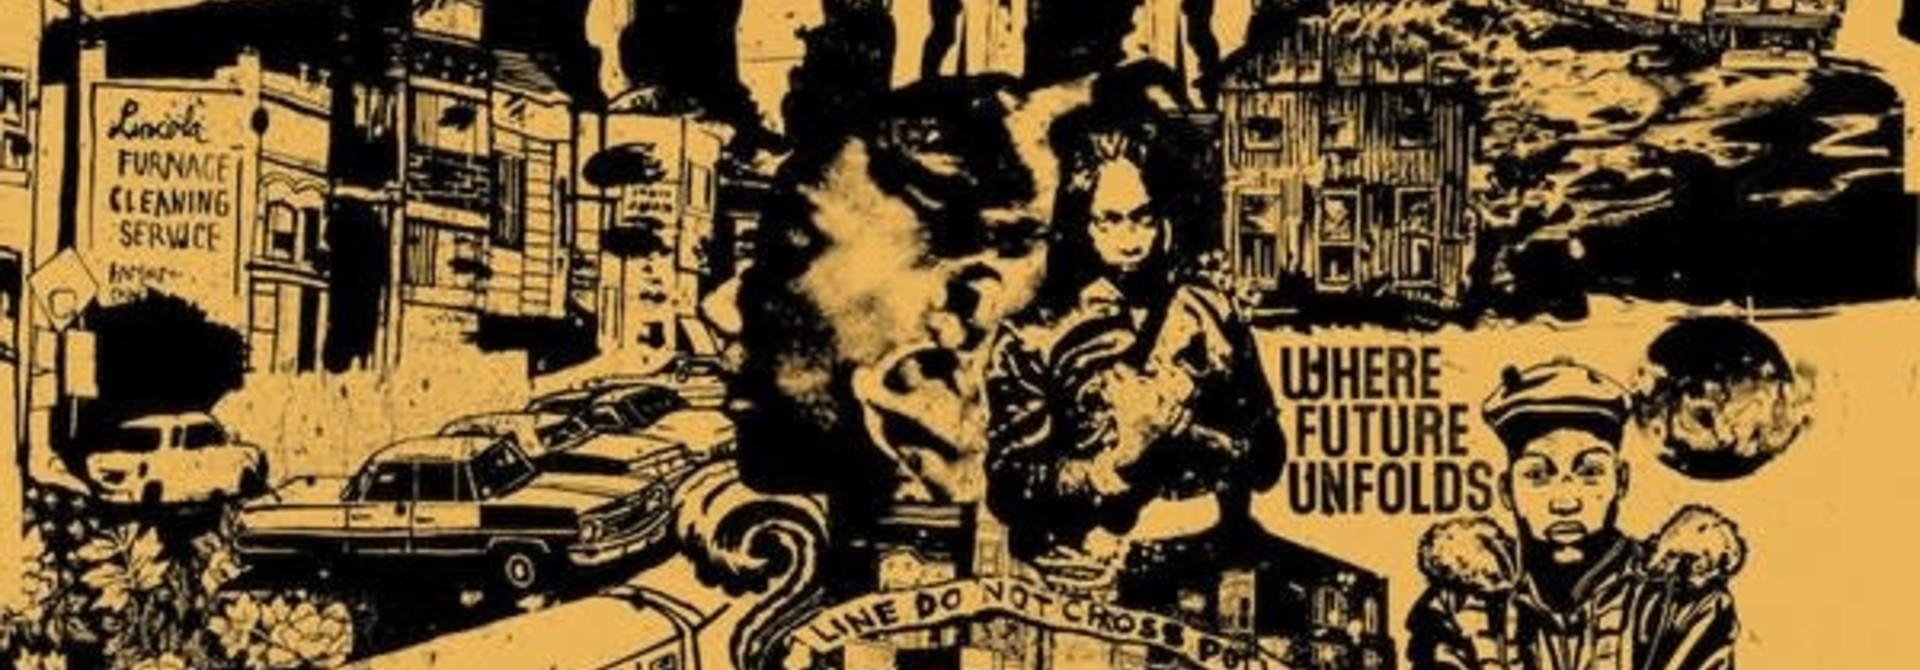 Damon Locks Black Monument Ensemble • Where Future Unfolds